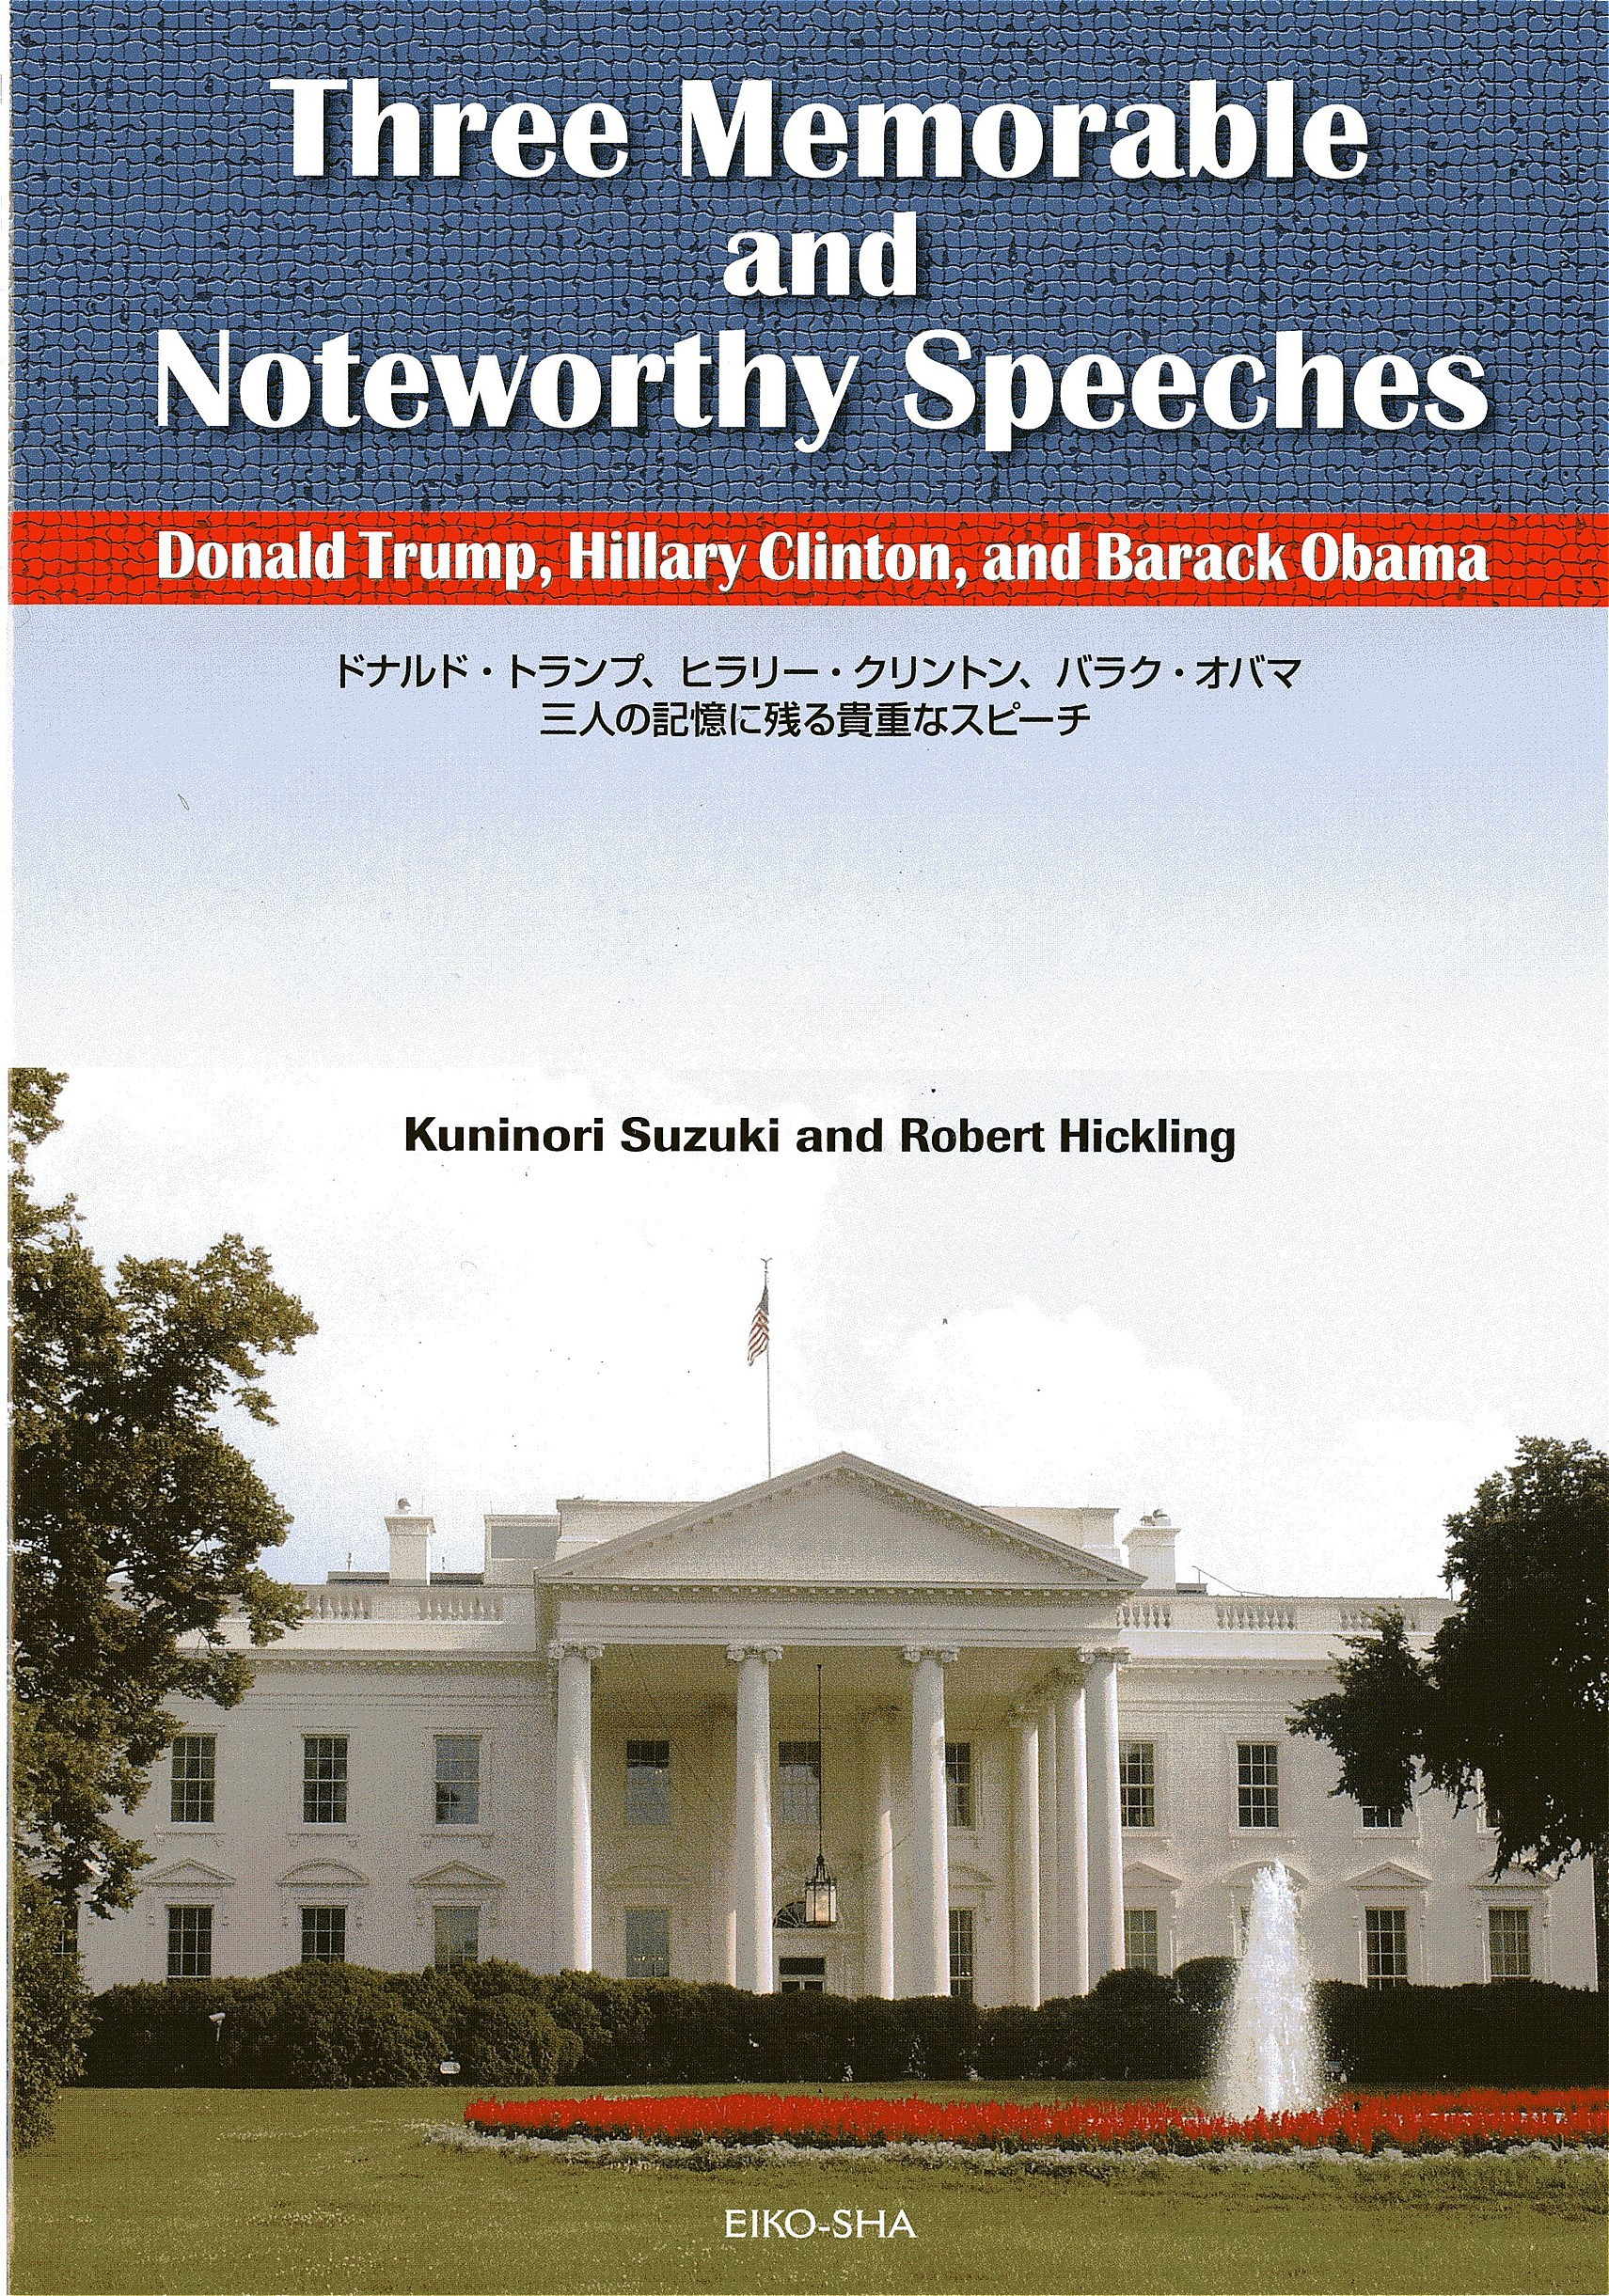 s-英光社、大学英語教科書『三つの記憶に残る演説』表紙